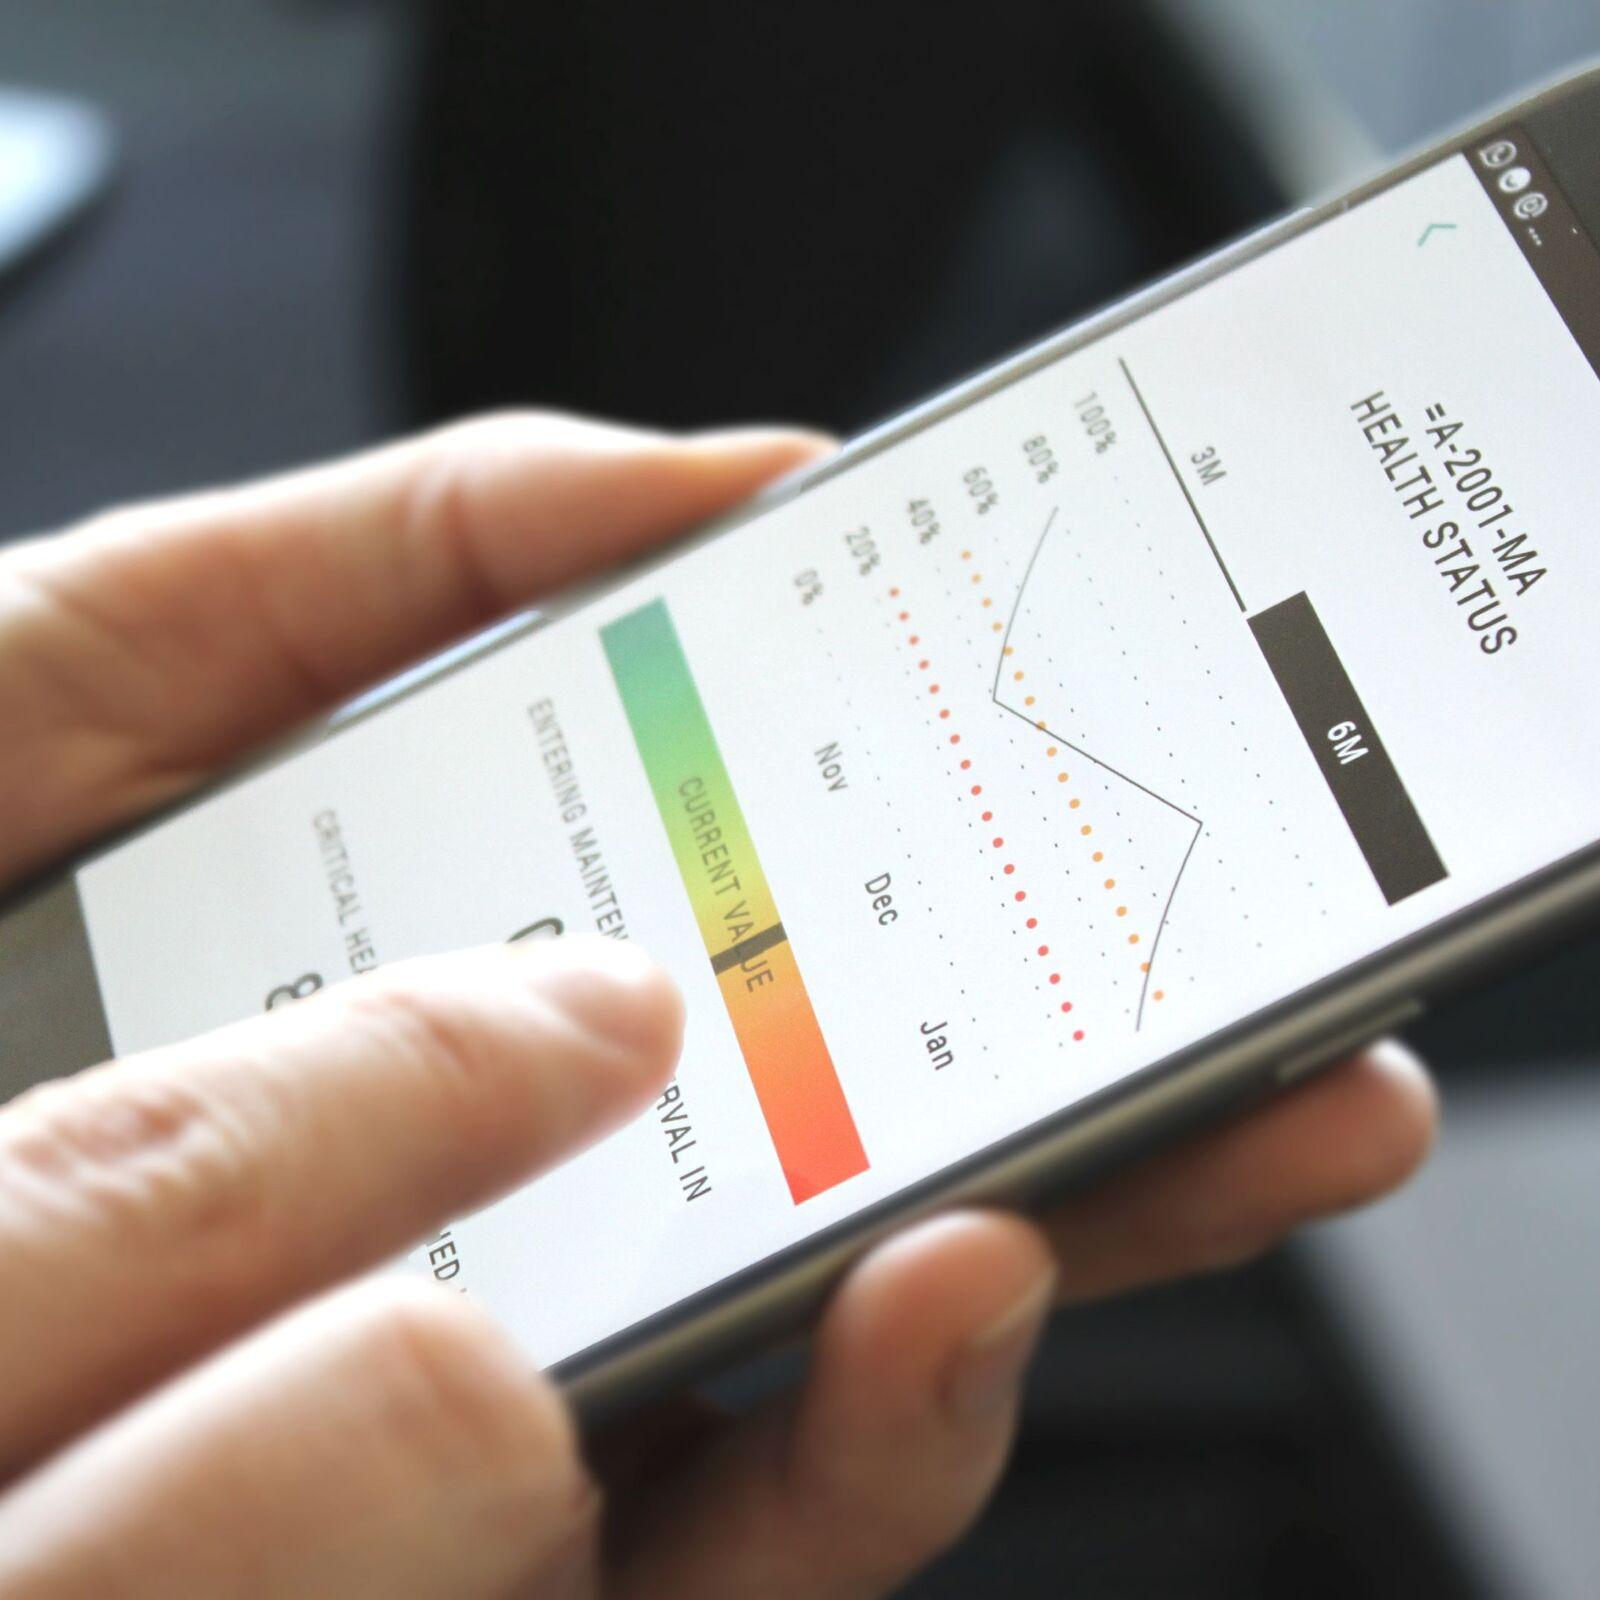 PreMa showing health status of a machine